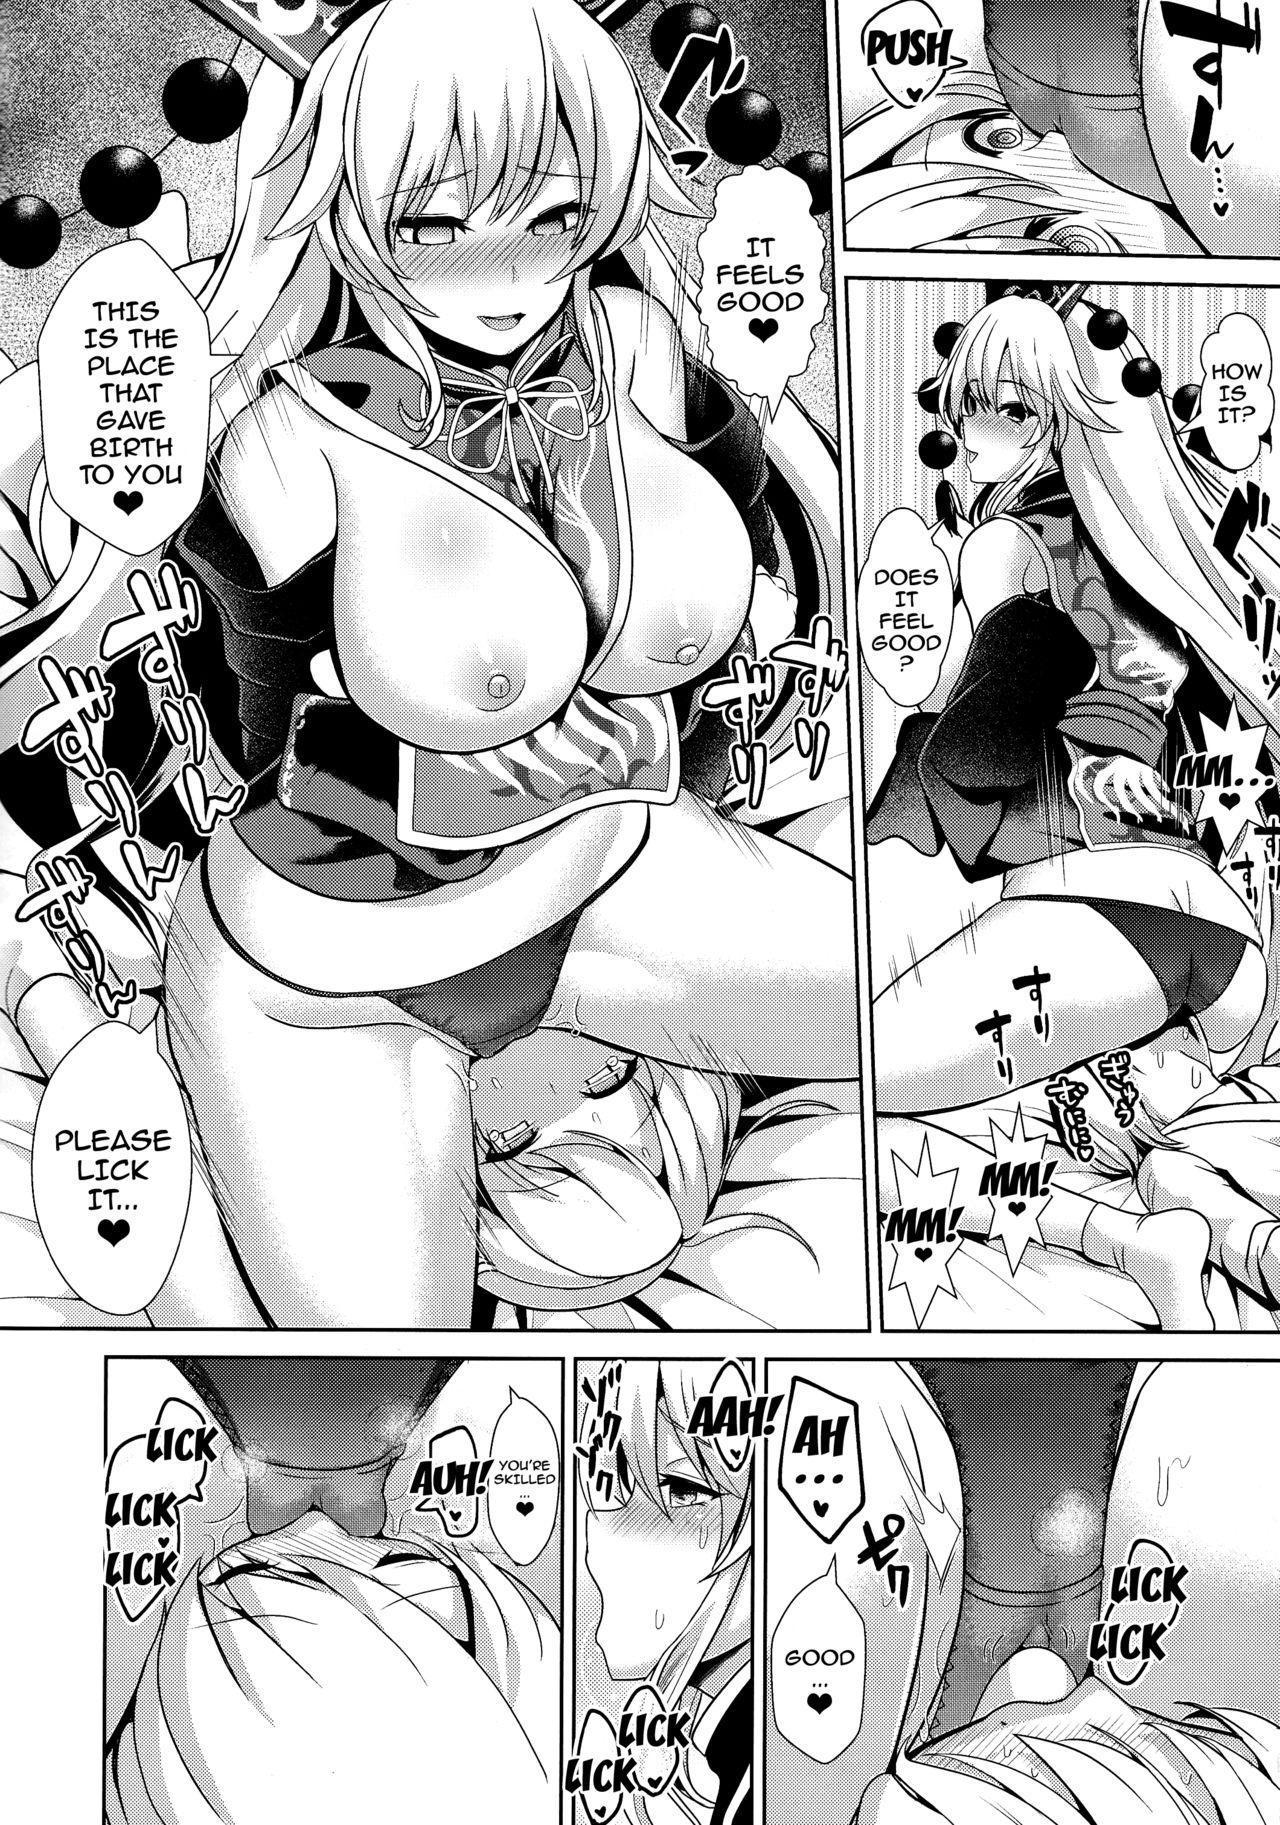 Touhou Ama Mama 1 Junko-san 6